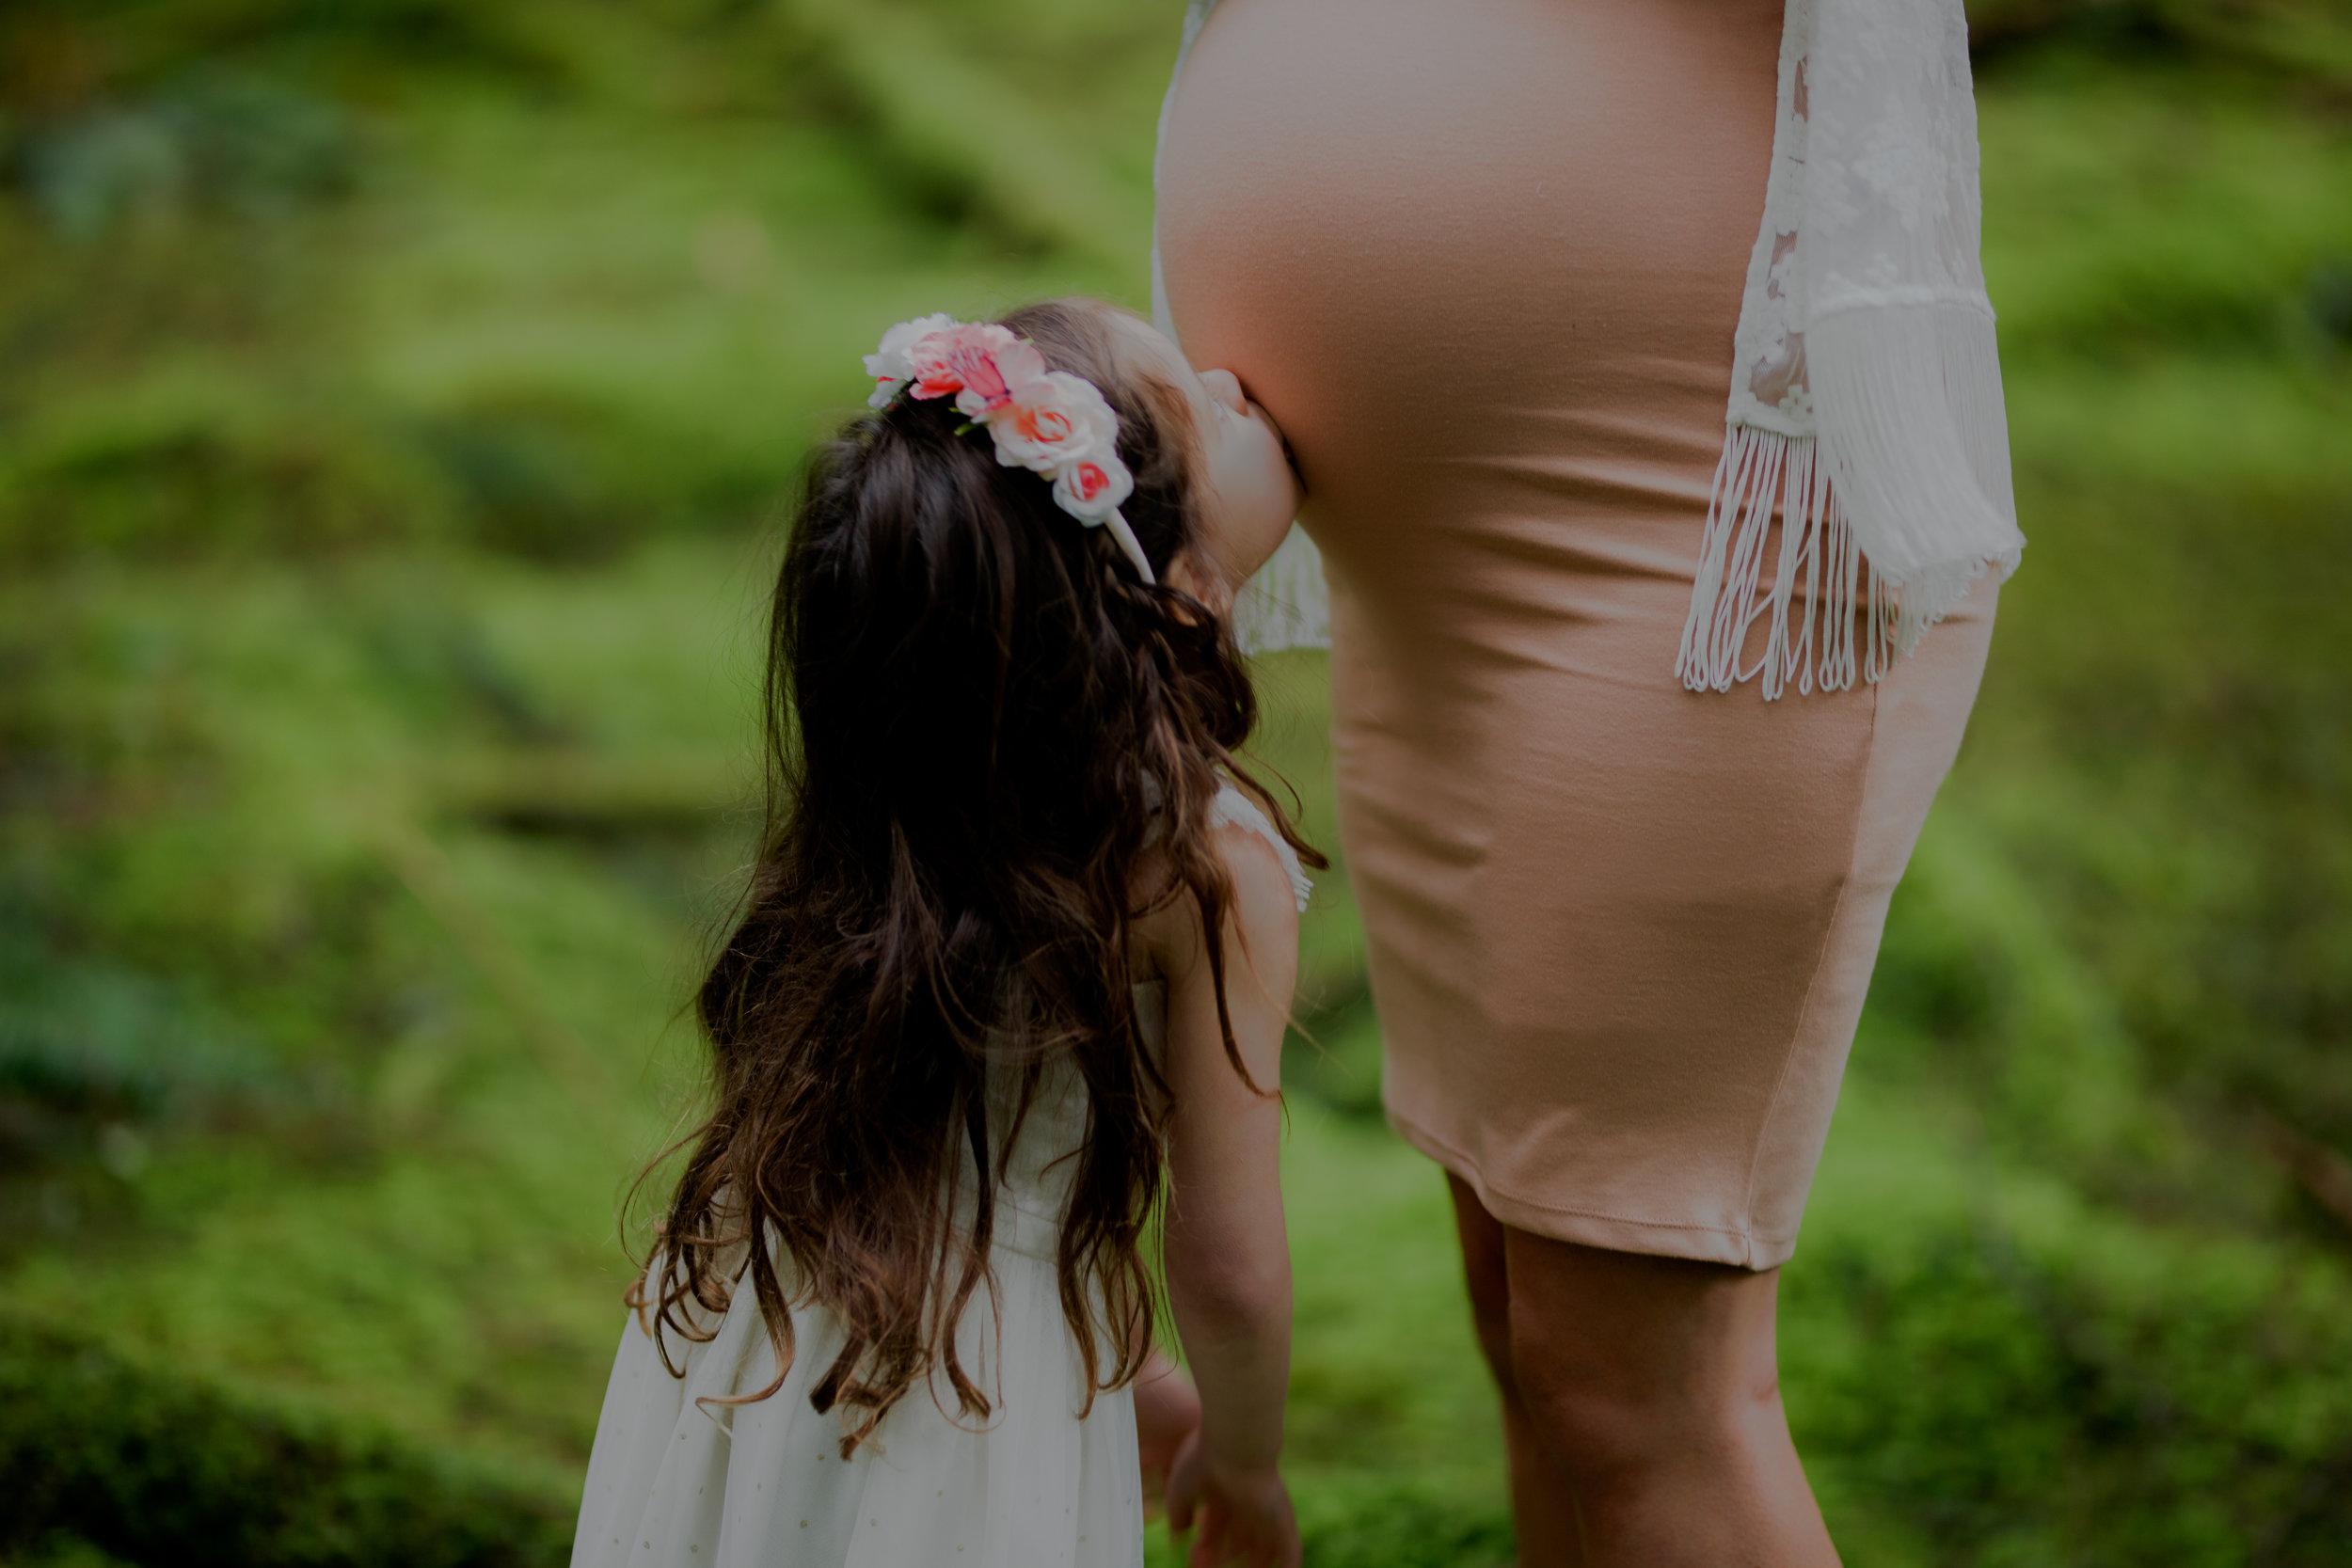 NadineHansenPhotography.Maternity Shoot in the luxurious west coast rainforest